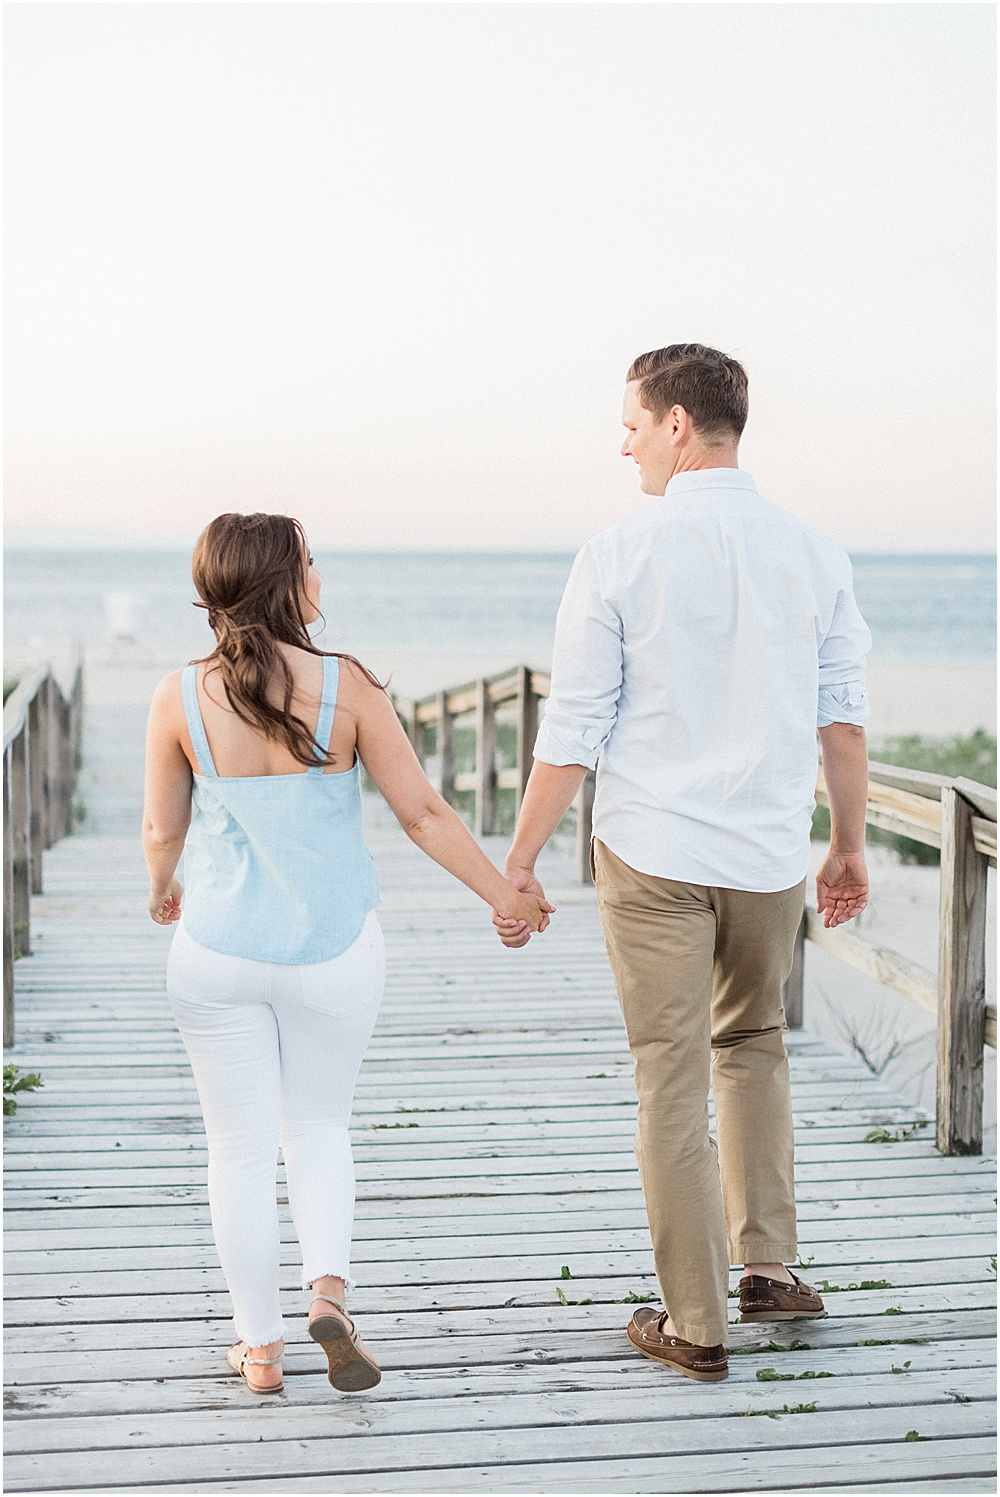 crane_estate_beach_engagement_ipswich_les_fleurs_andover_lyndsay_simon_beauty_massachusetts_boston_wedding_photographer_meredith_jane_photography_photo_0335.jpg